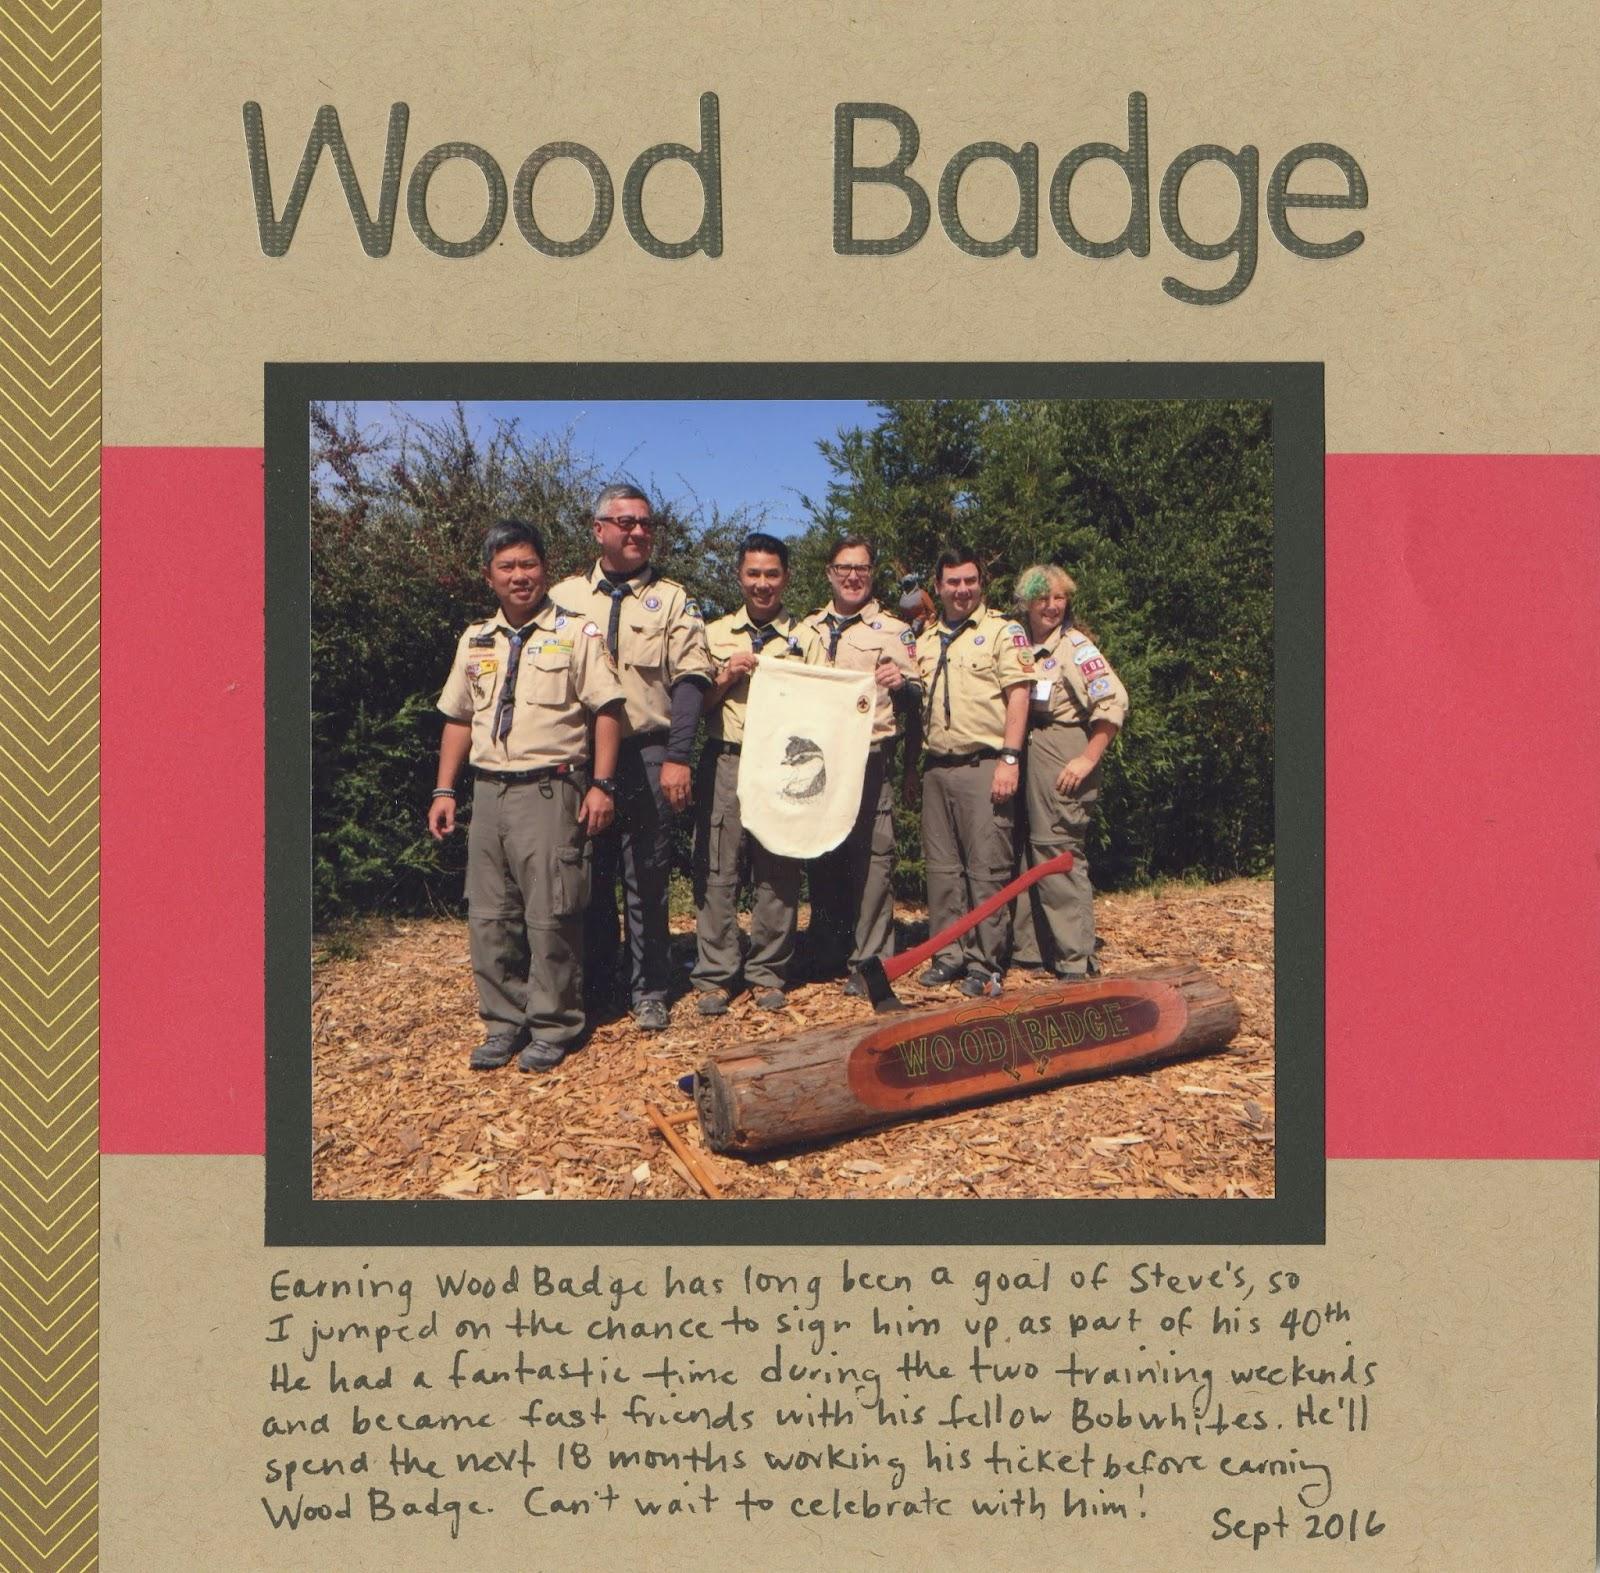 Cindy deRosier: My Creative Life: 40-4-Steve: Wood Badge